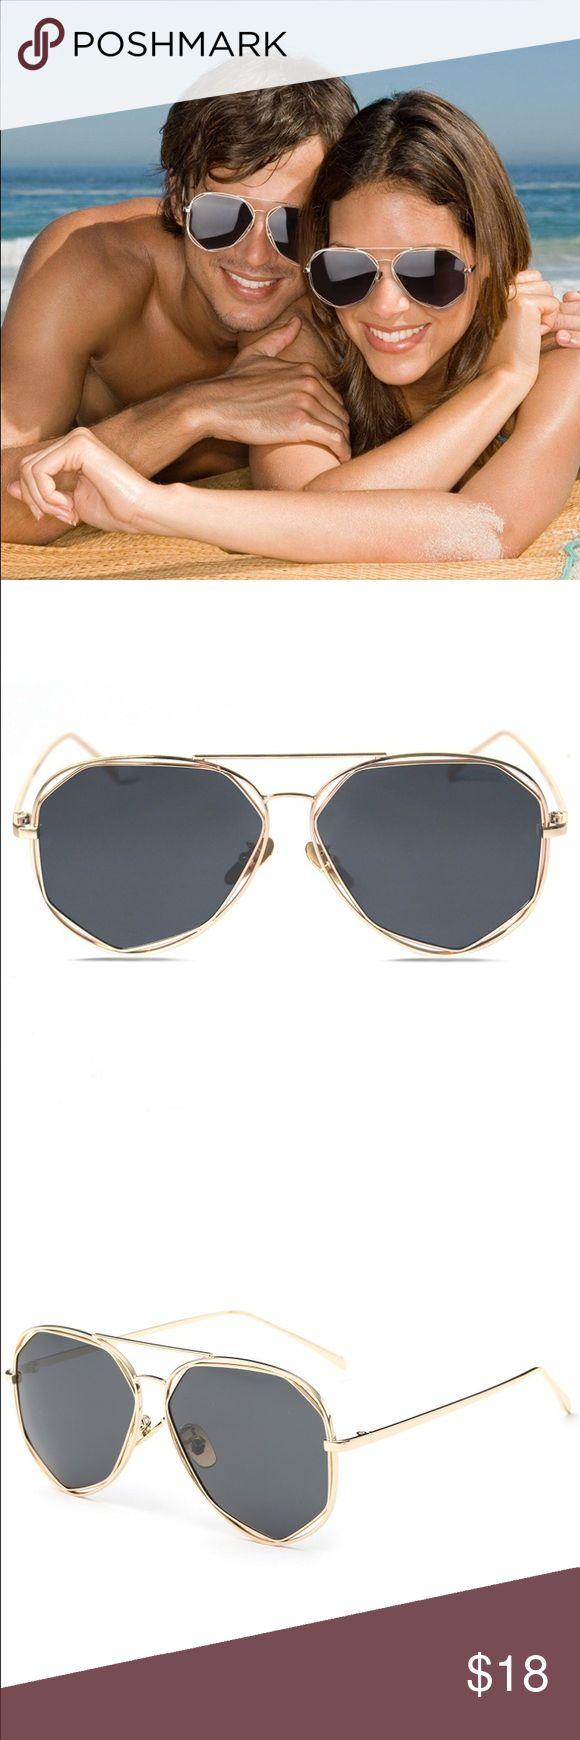 Fashion Gold Frame Polarized Sunglasses Fashion Gold Frame Polarized Sunglasses with Mirrored Lens. Brand new. 58 mm Accessories Sunglasses